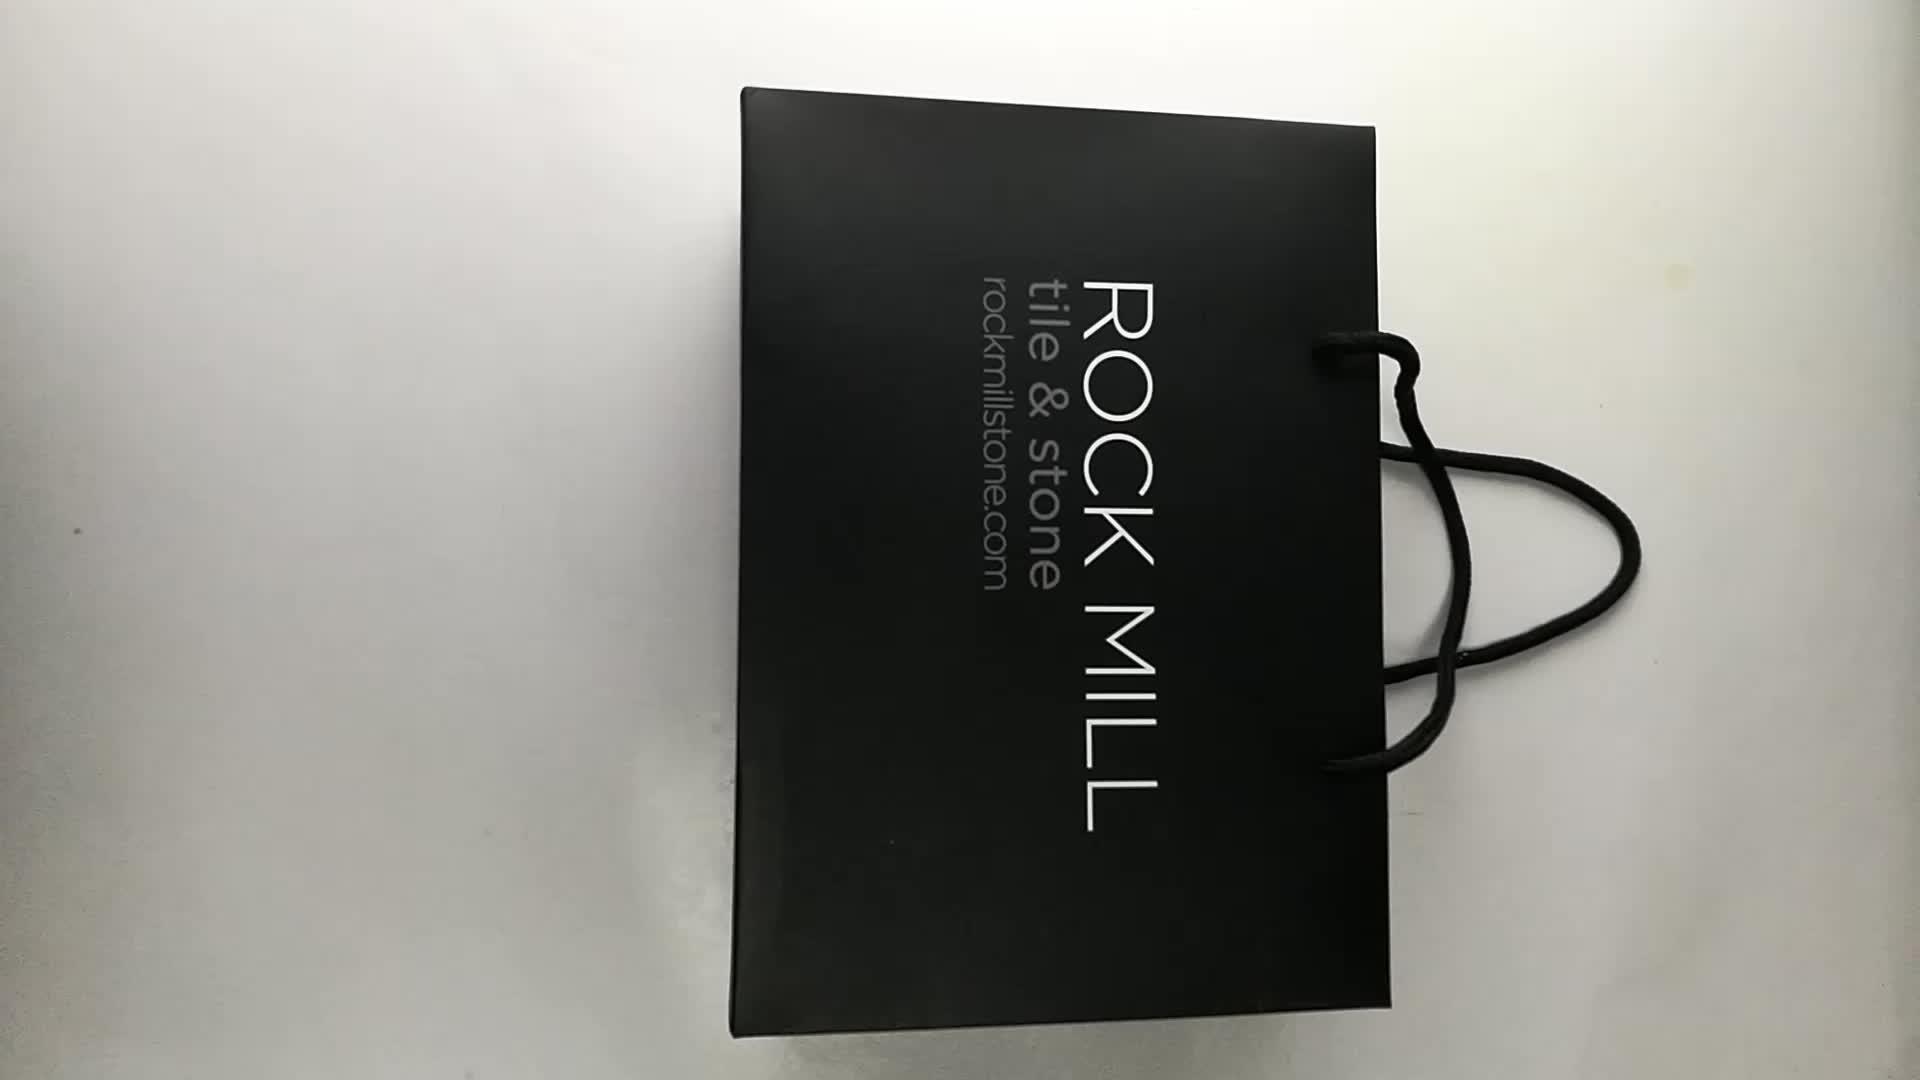 उपहार पेपर बैग, साटन सुरुचिपूर्ण काले कागज उपहार बैग थोक